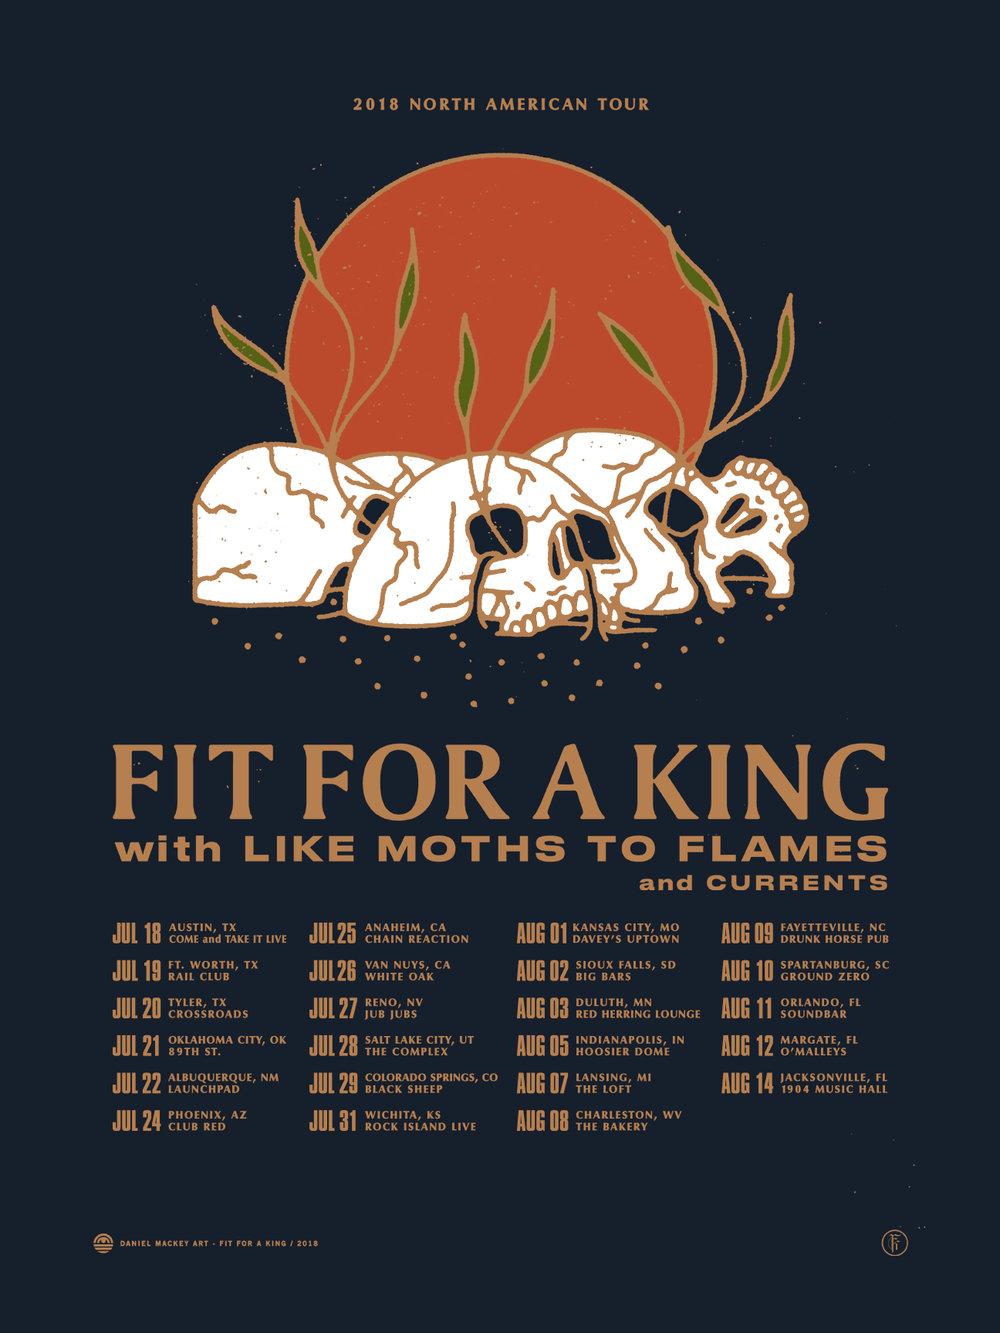 FFAK-tour-dates[2018].jpg